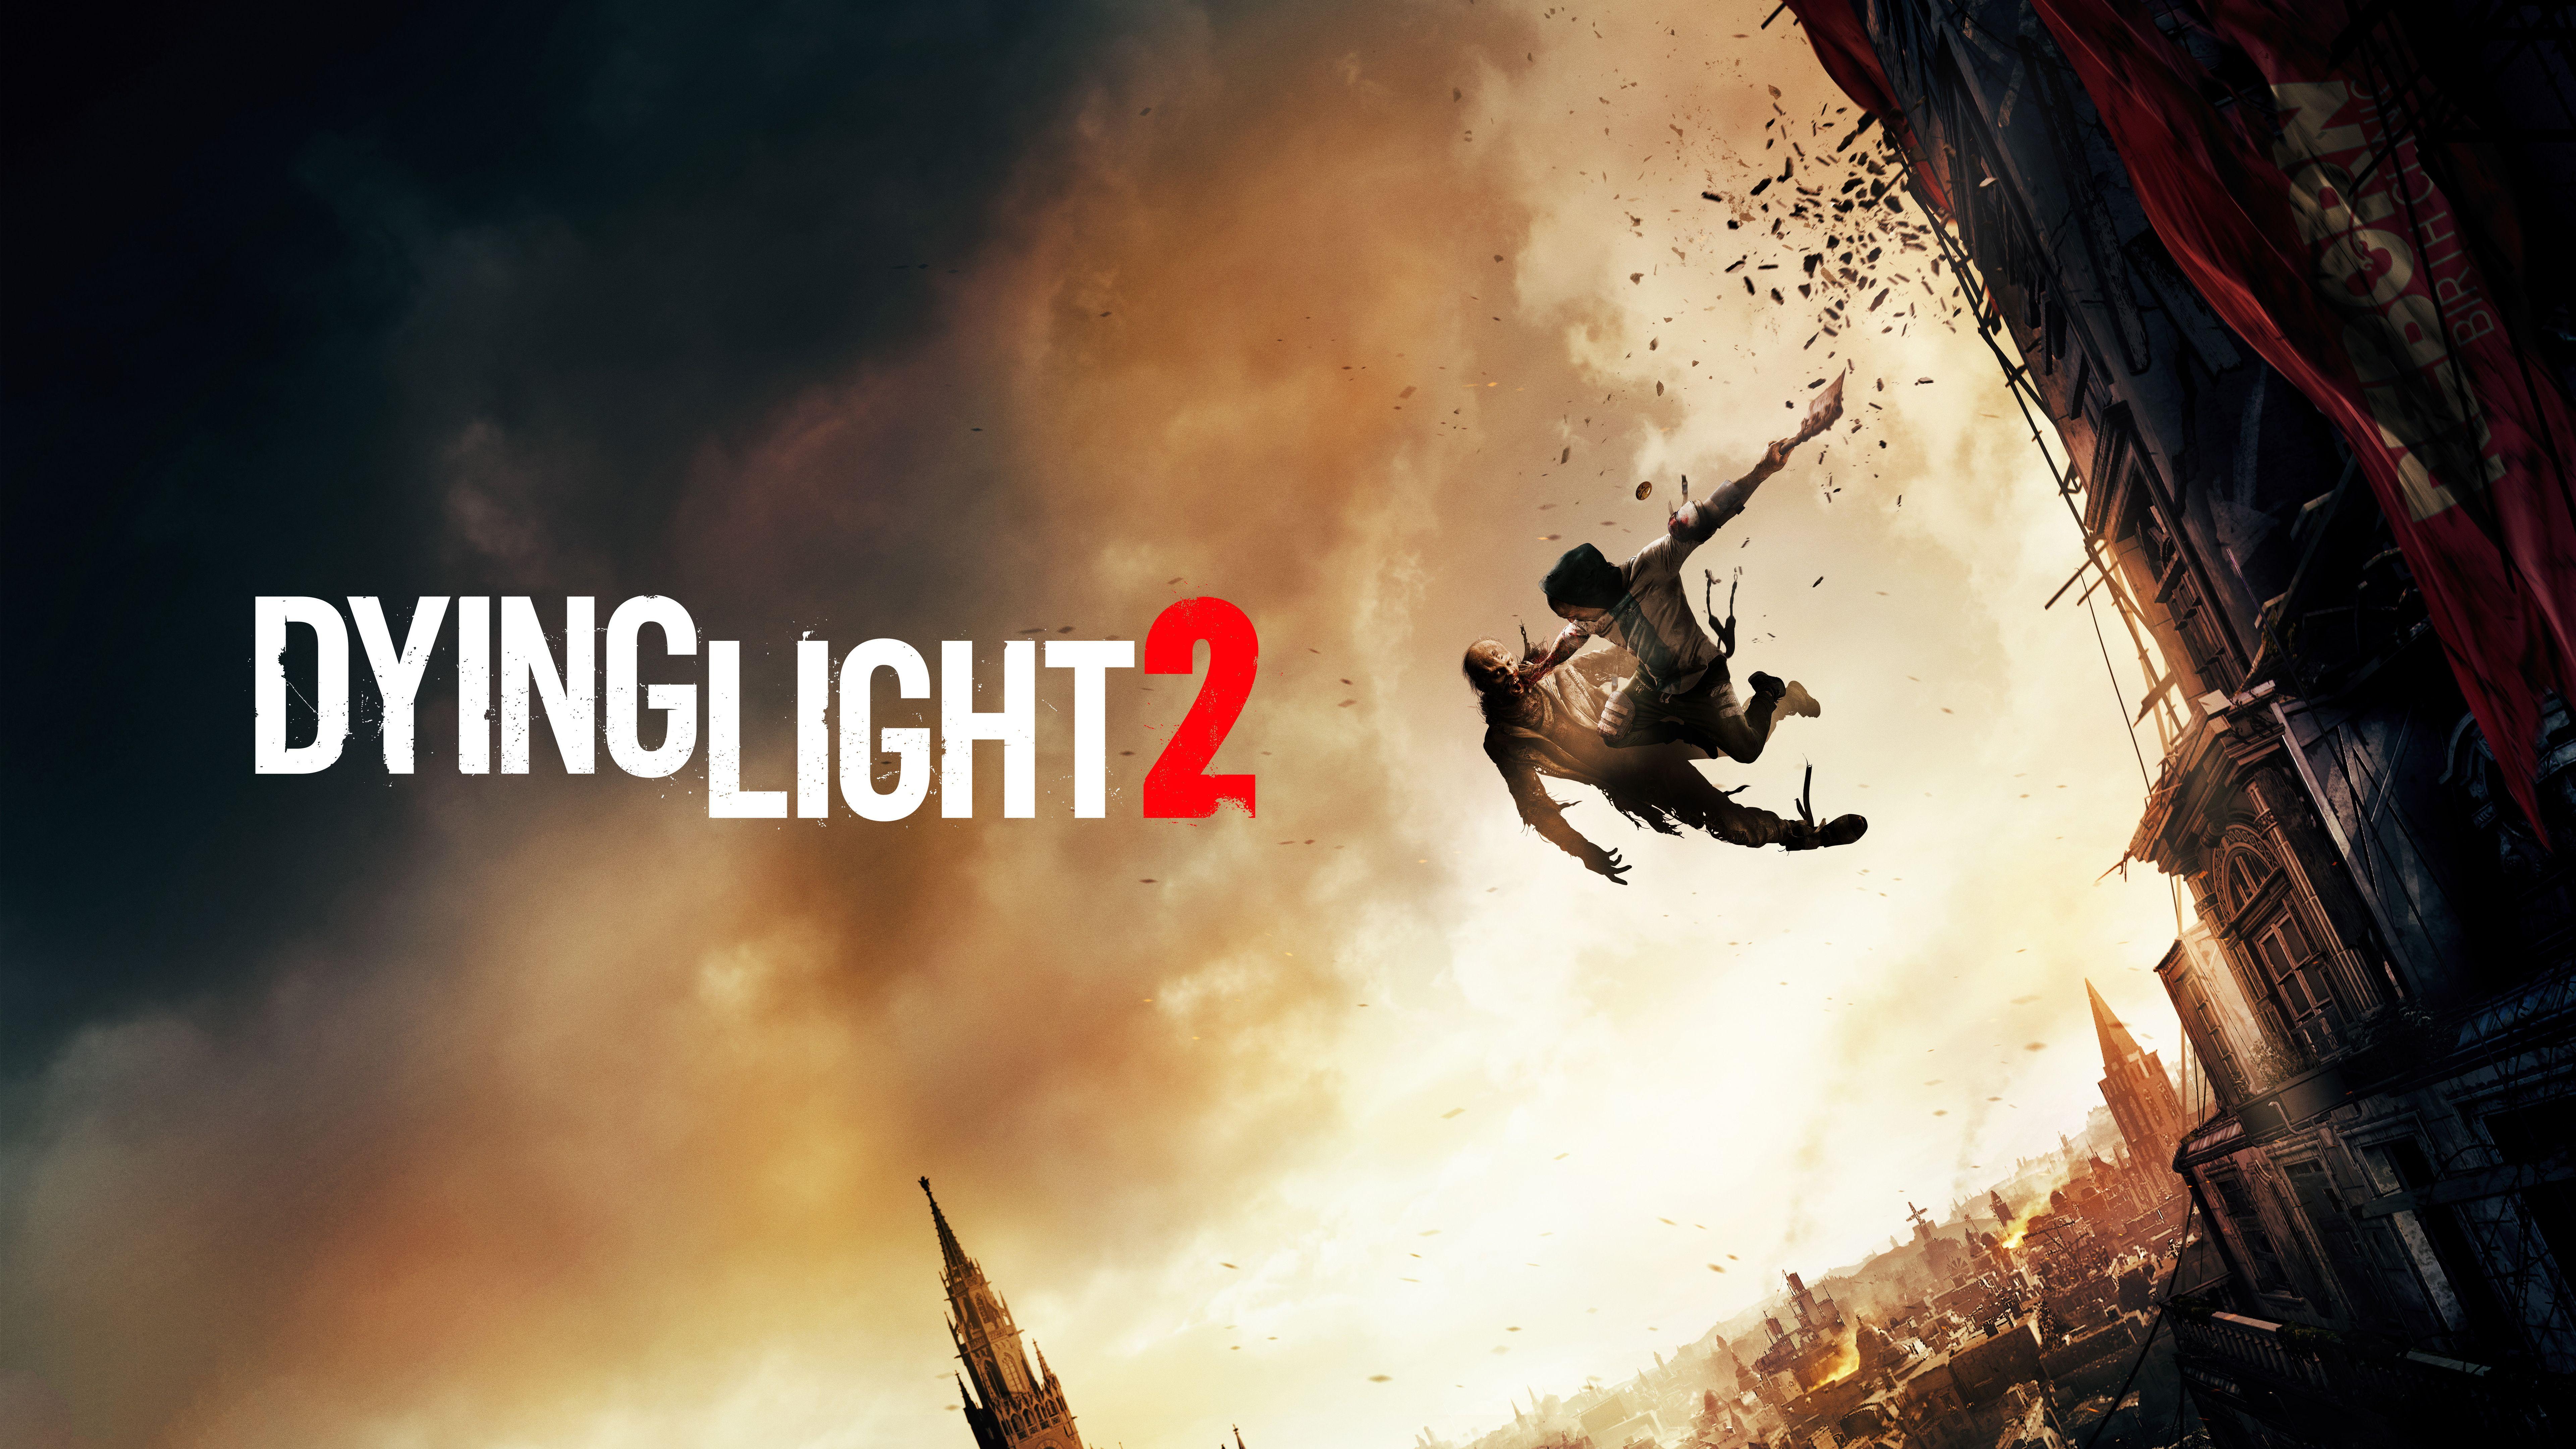 Dying Light 2 8k Wallpaper Video Game News E3 2018 Video Games